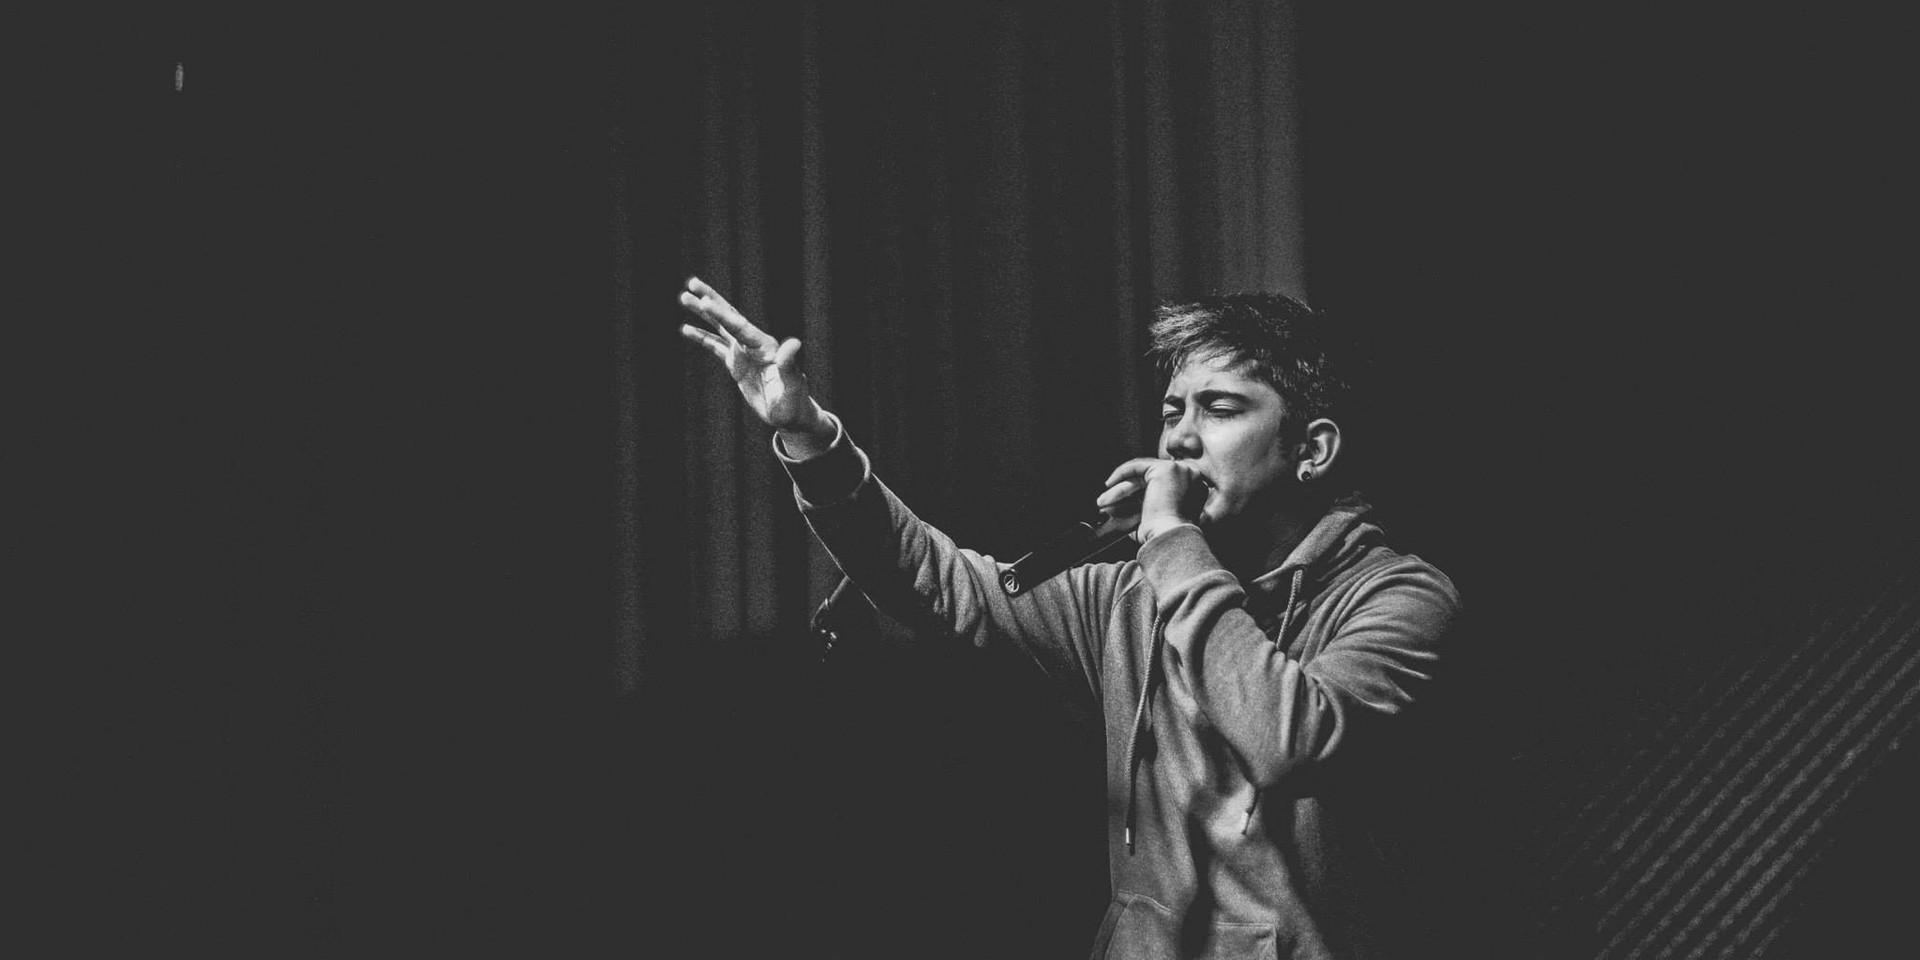 Introducing: The freewheeling, lyrically potent hip-hop of NINNO